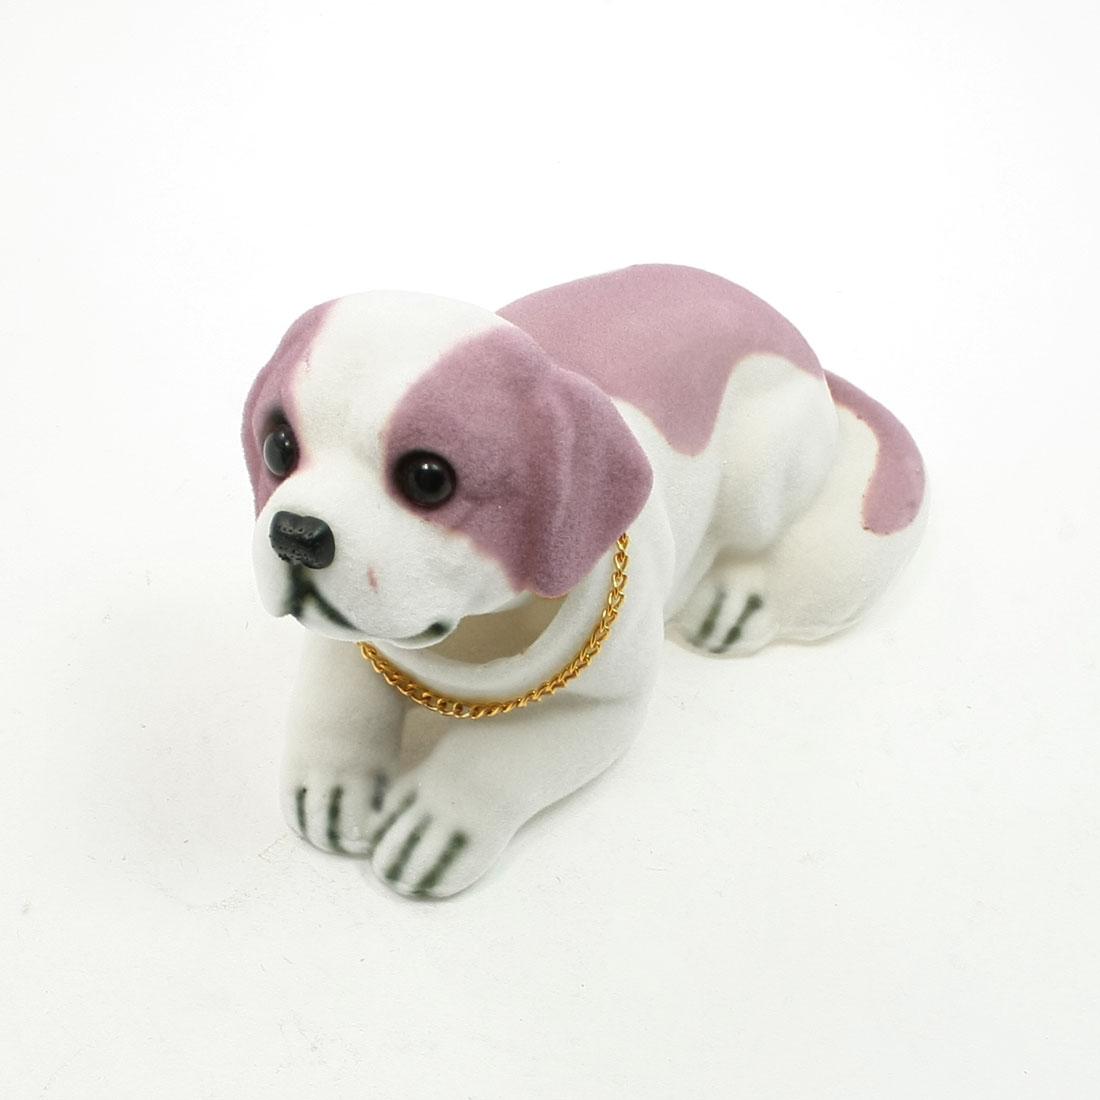 Metal Saint Bernard Nodding Dog Ornament for Cars Auto Vehicle